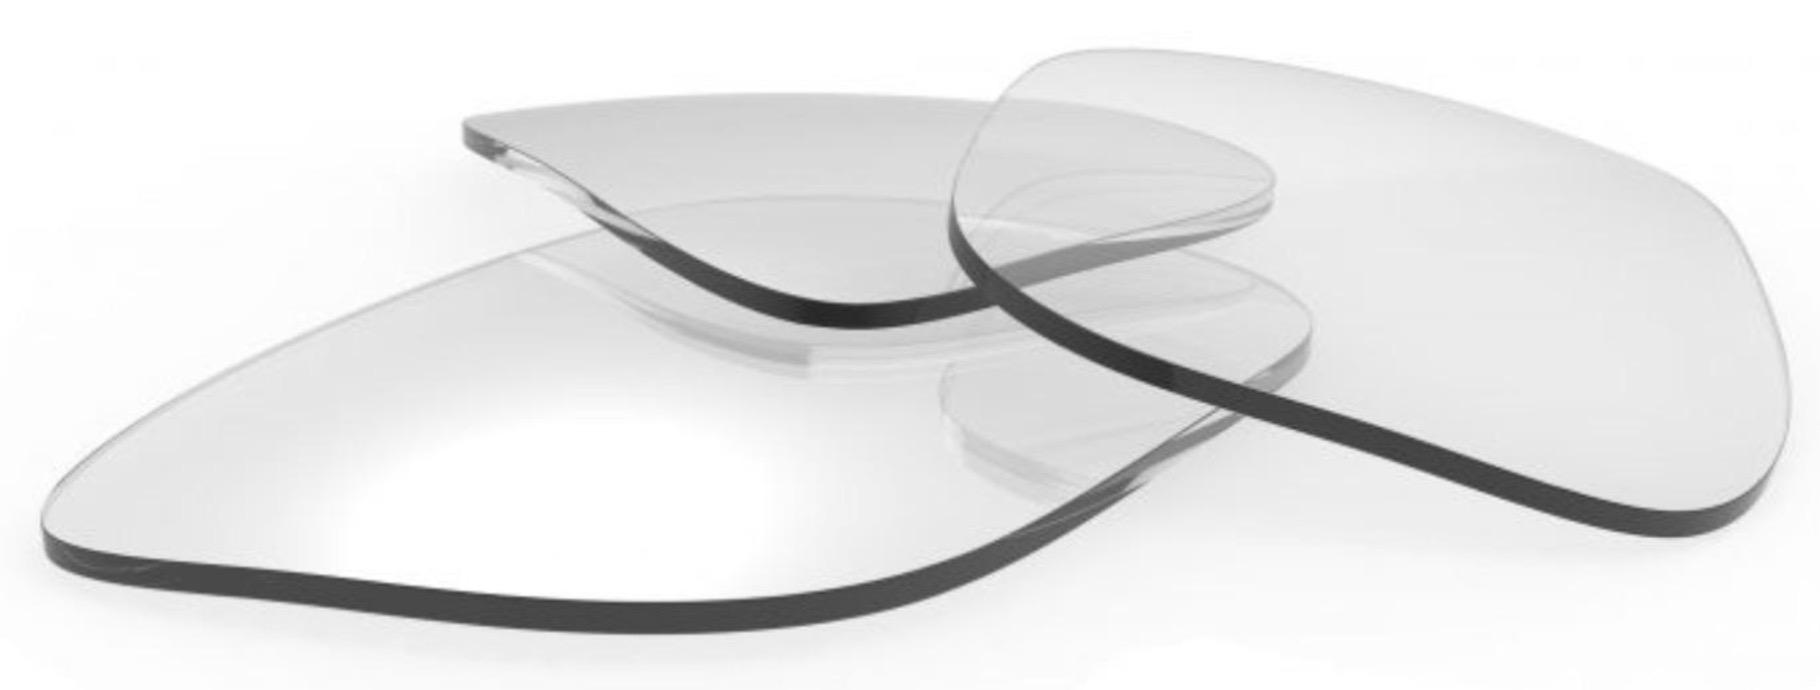 Prescription Lenses Material